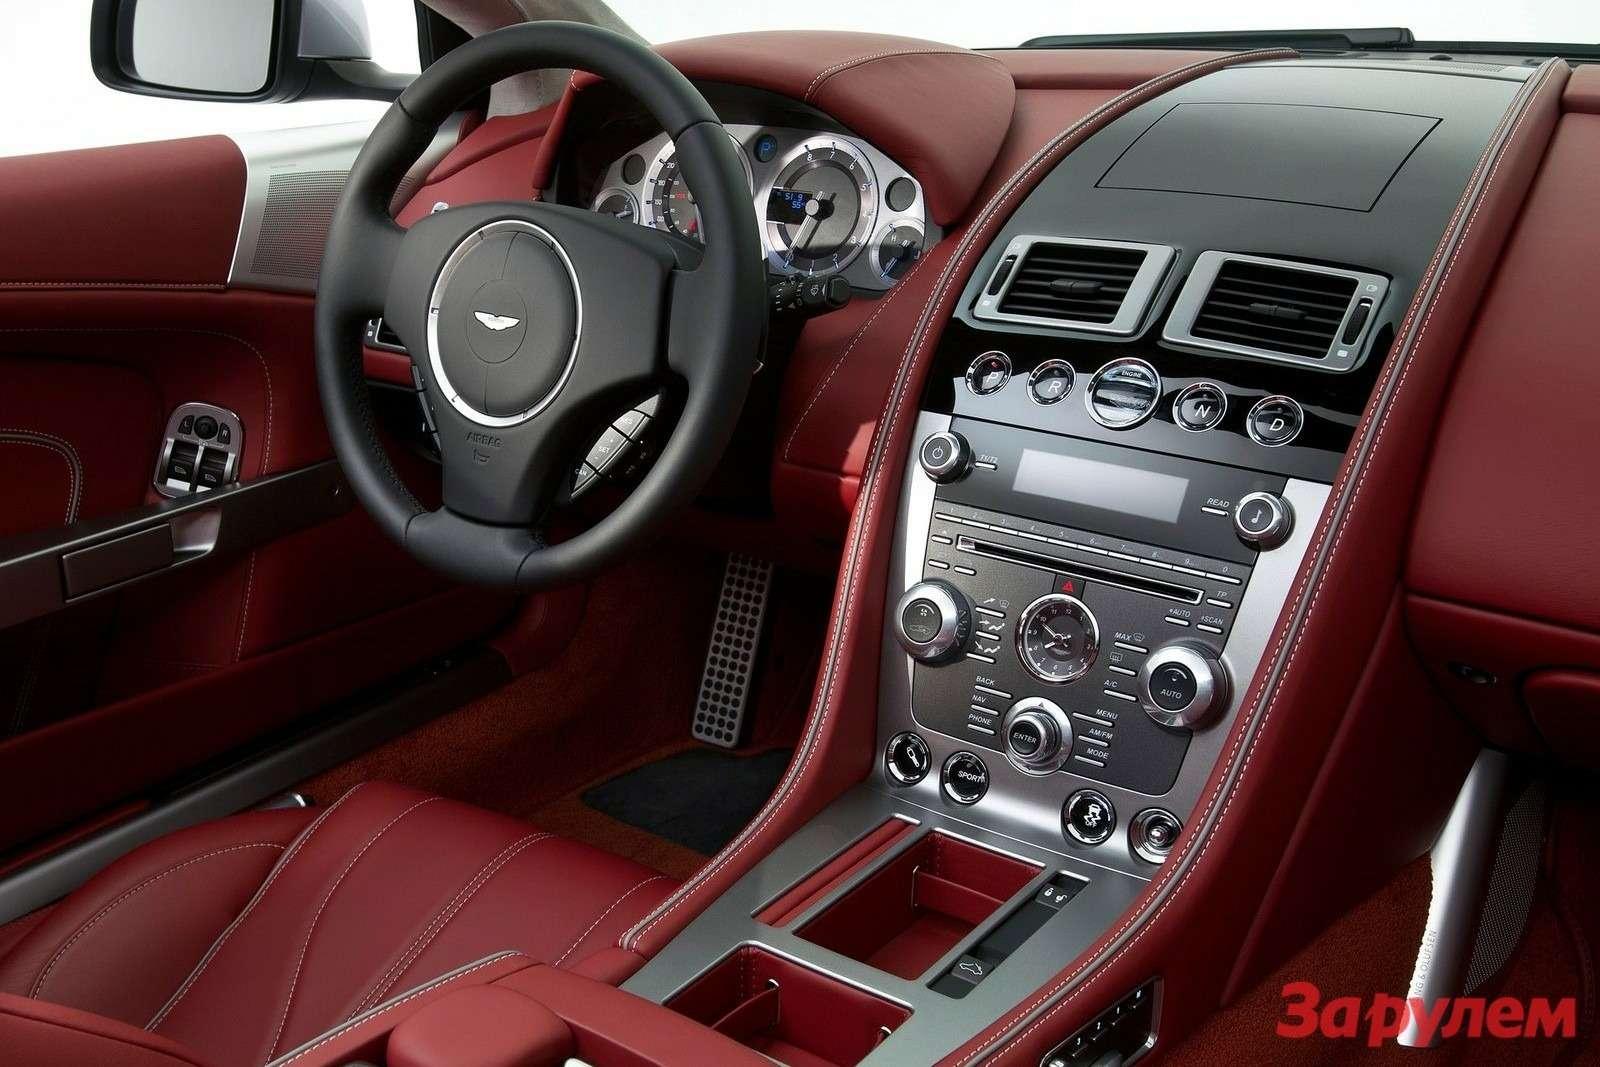 Restyled Aston Martin DB9 inside